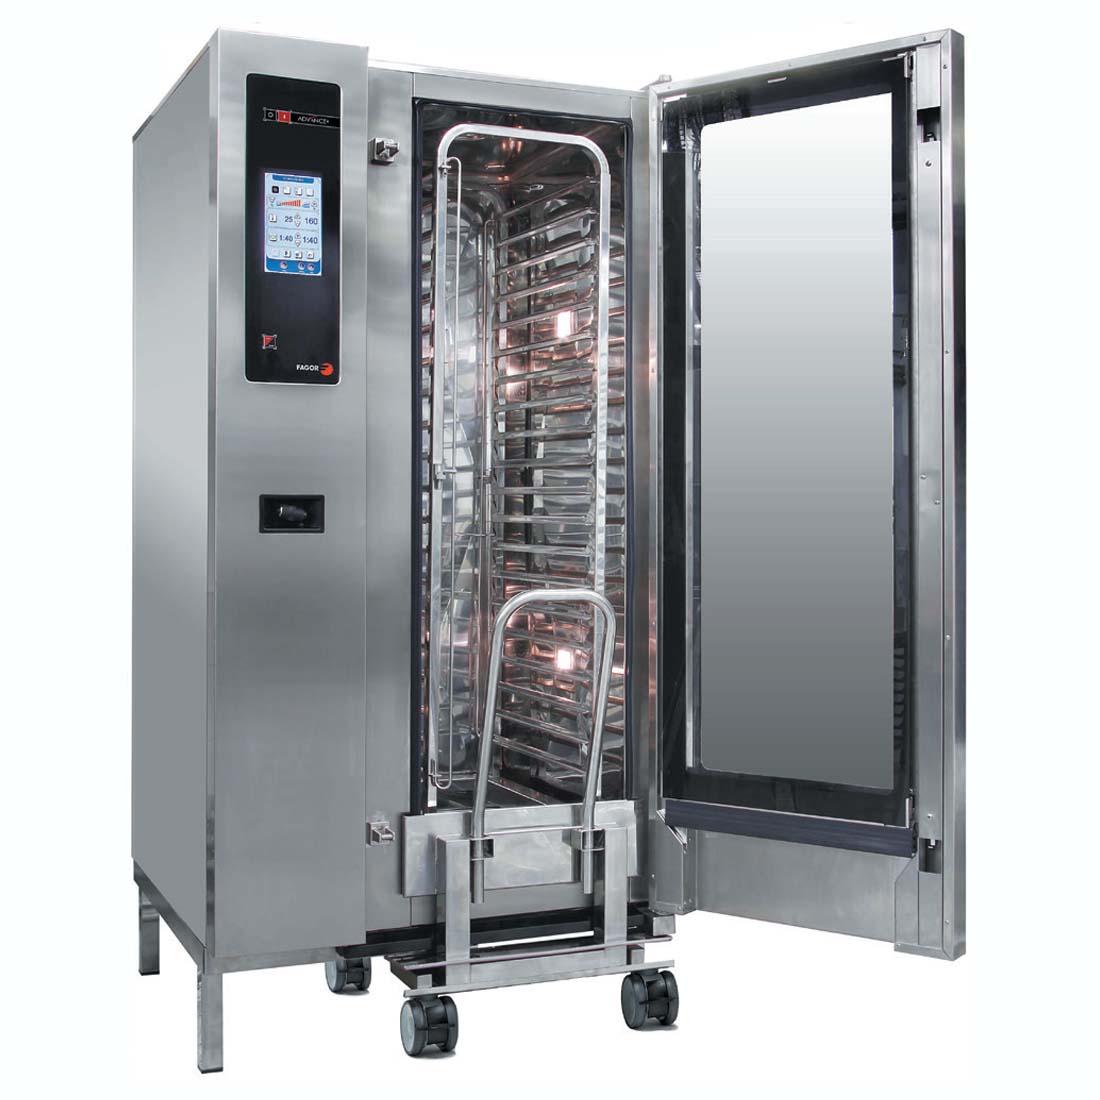 Fagor Advanced Plus Electric 20 Trays Combi Oven - APE-201